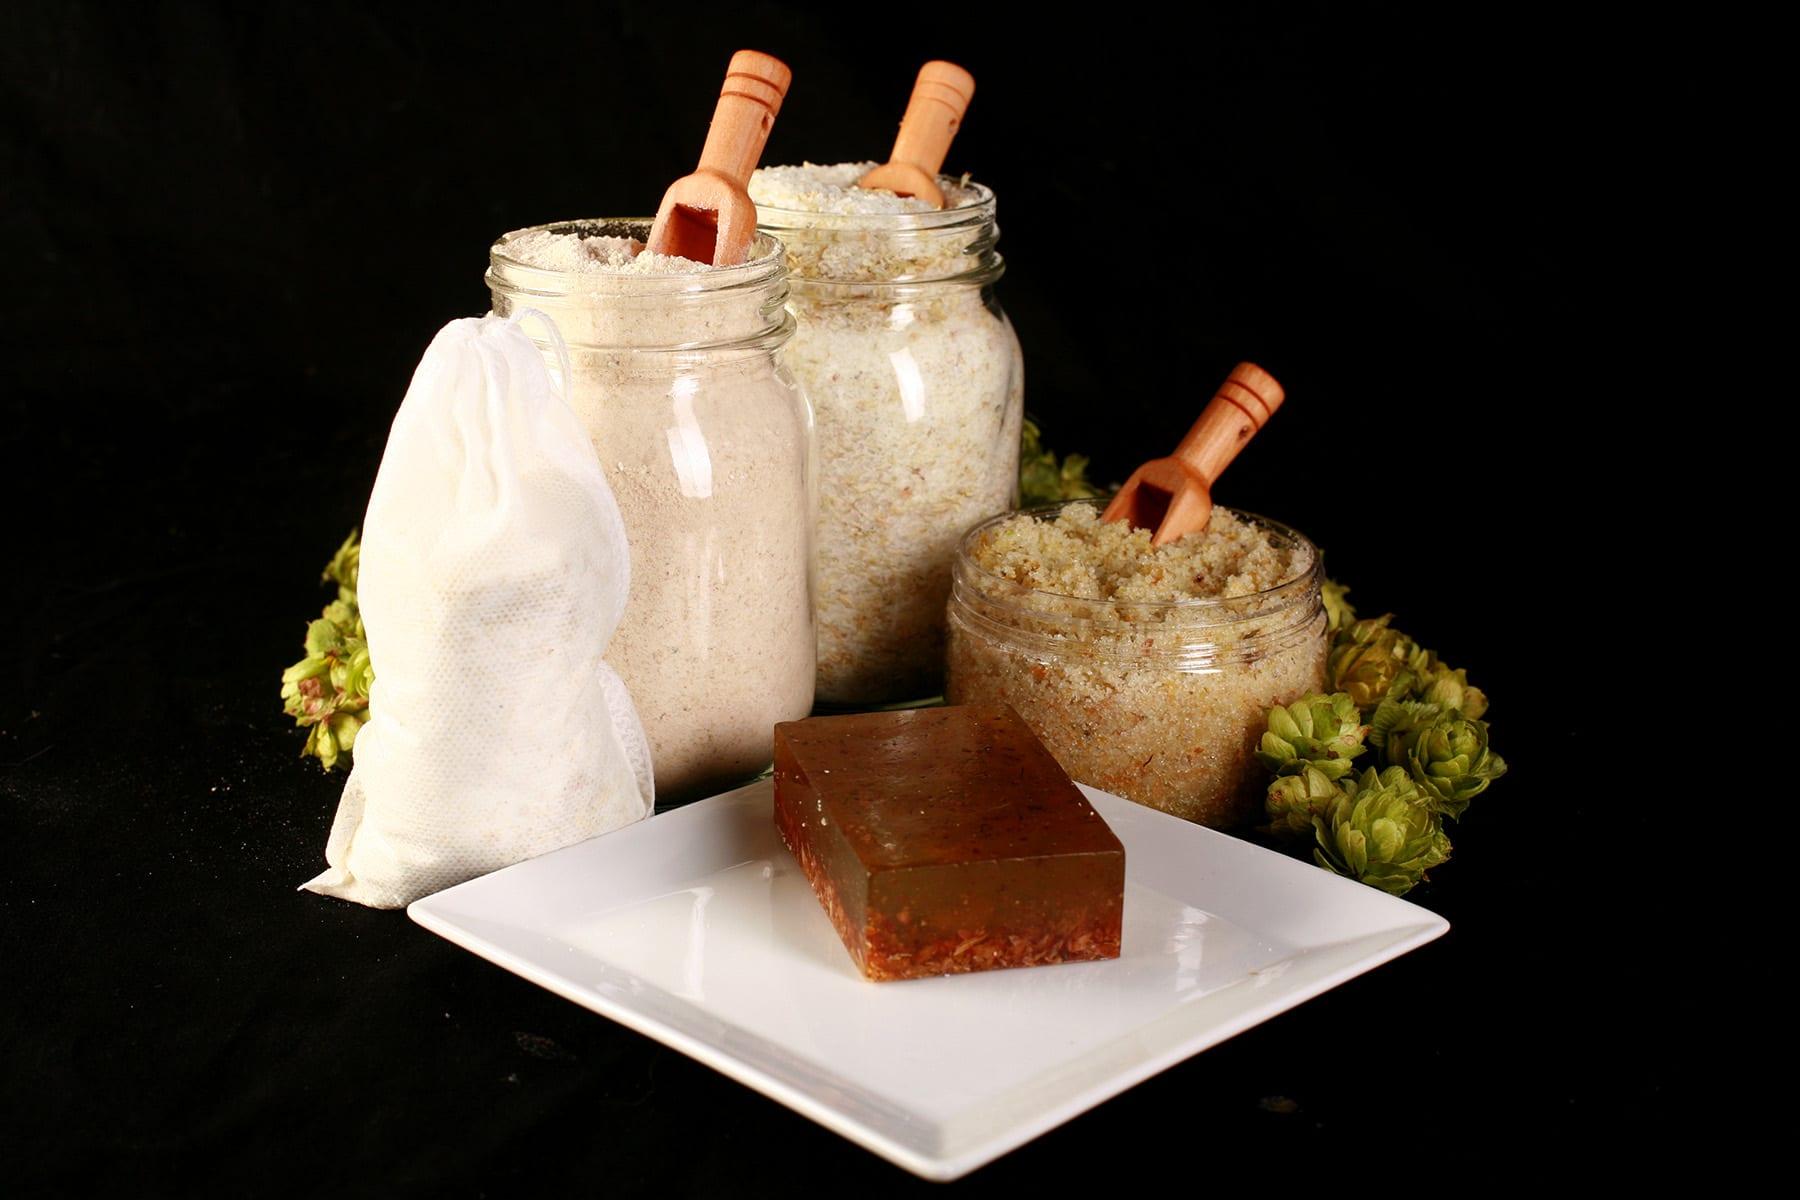 A 4 piece hop spa set, including a bar of hop soap, a canister of hop salt scrub, a jar of hop bath salt, and a jar of hop malted milk bath.